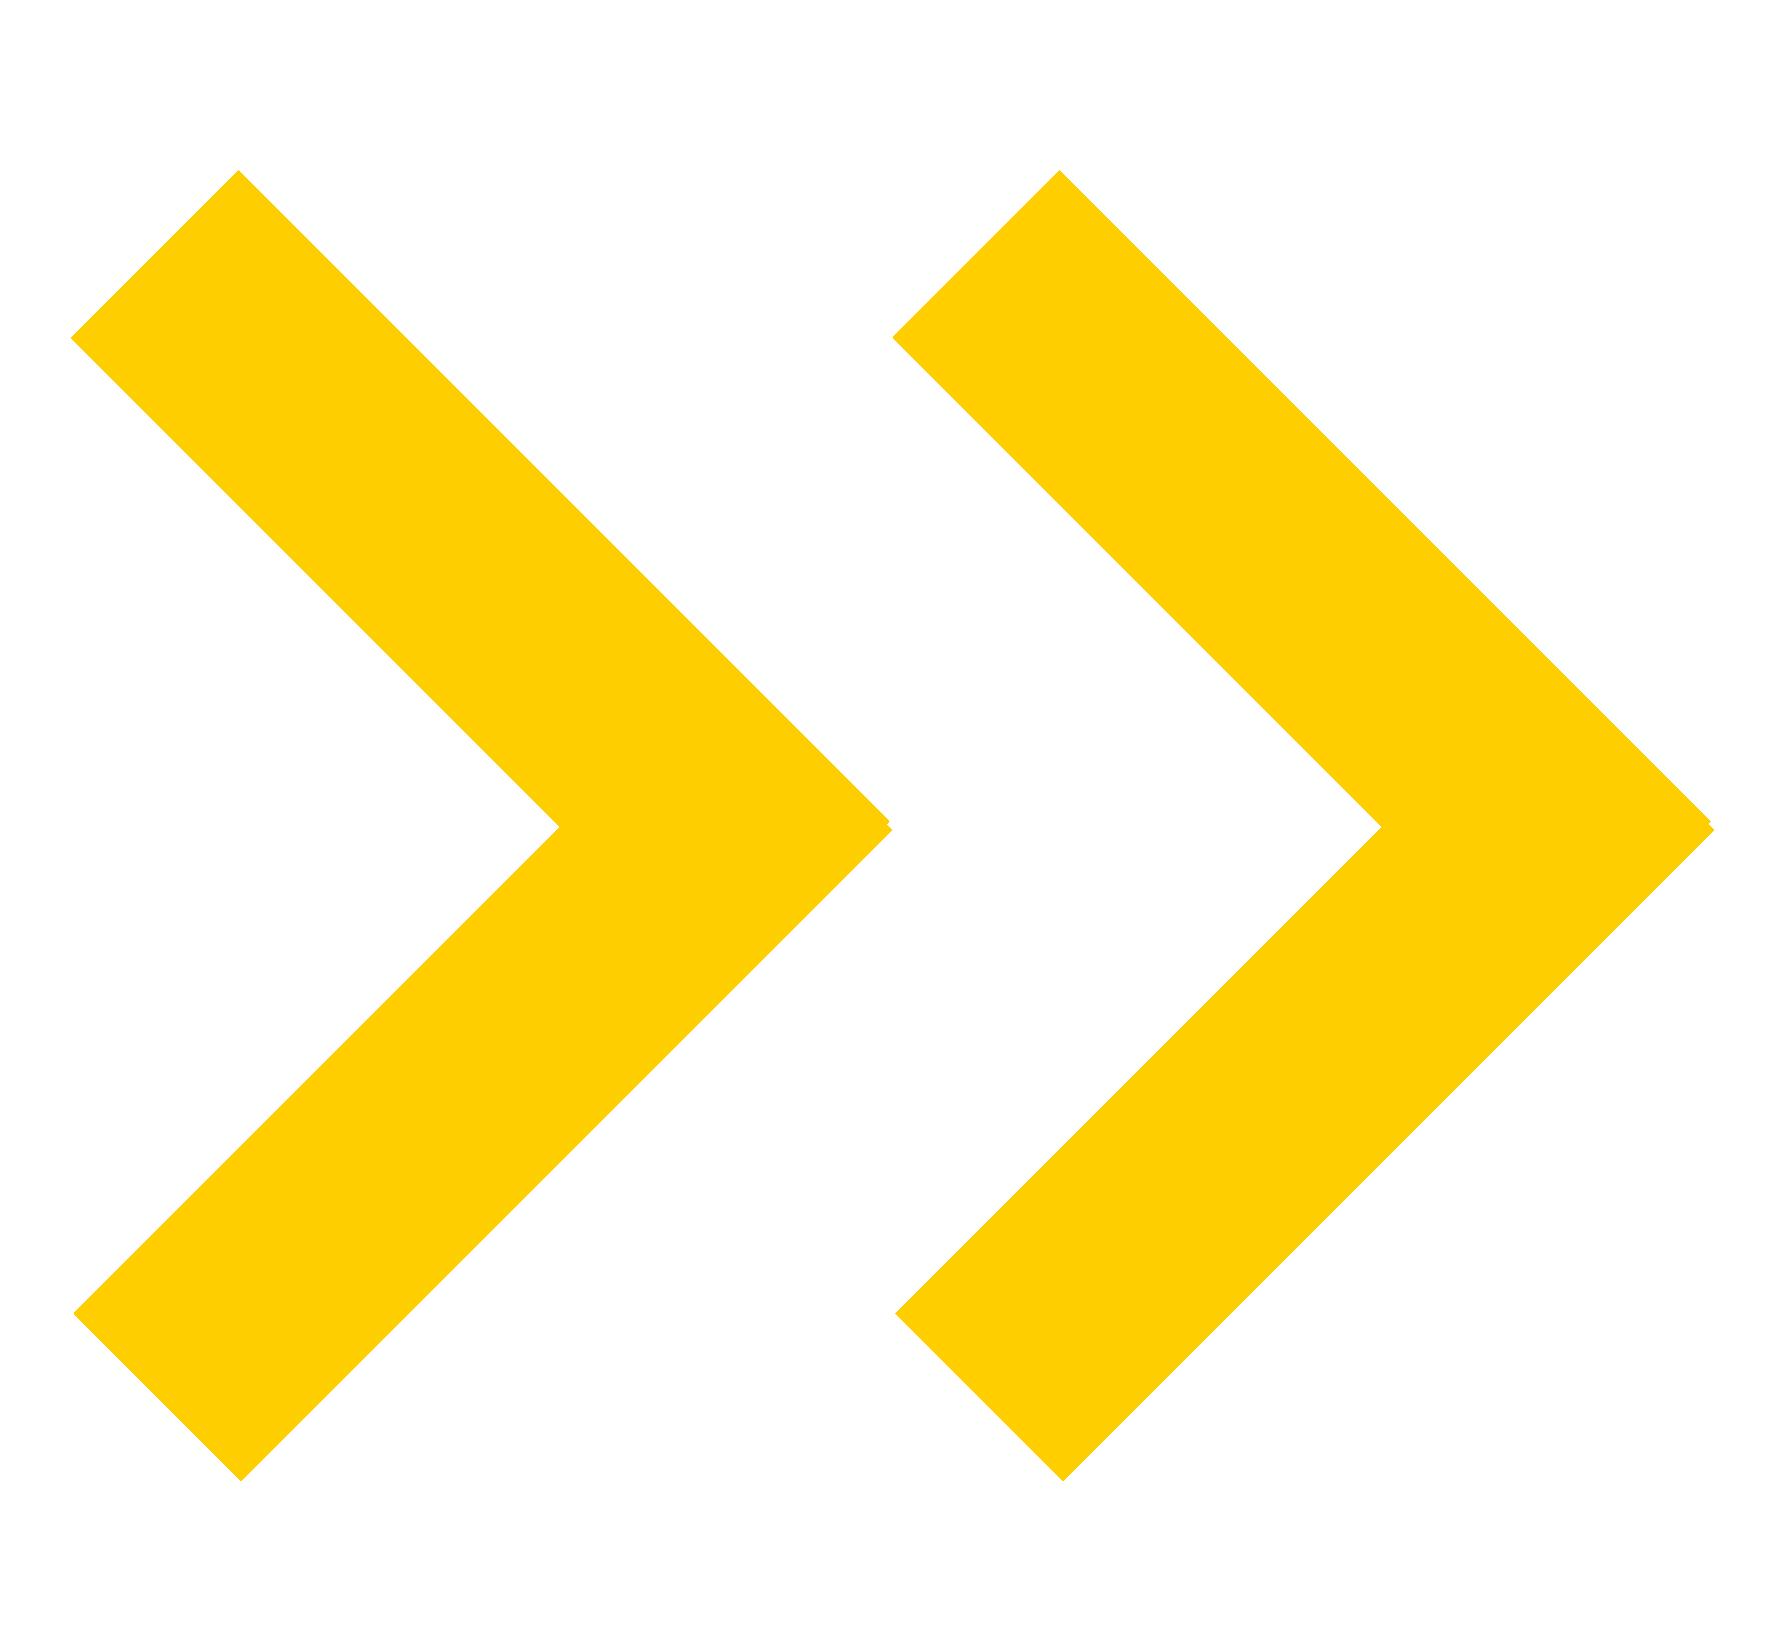 seta amarela decorativa